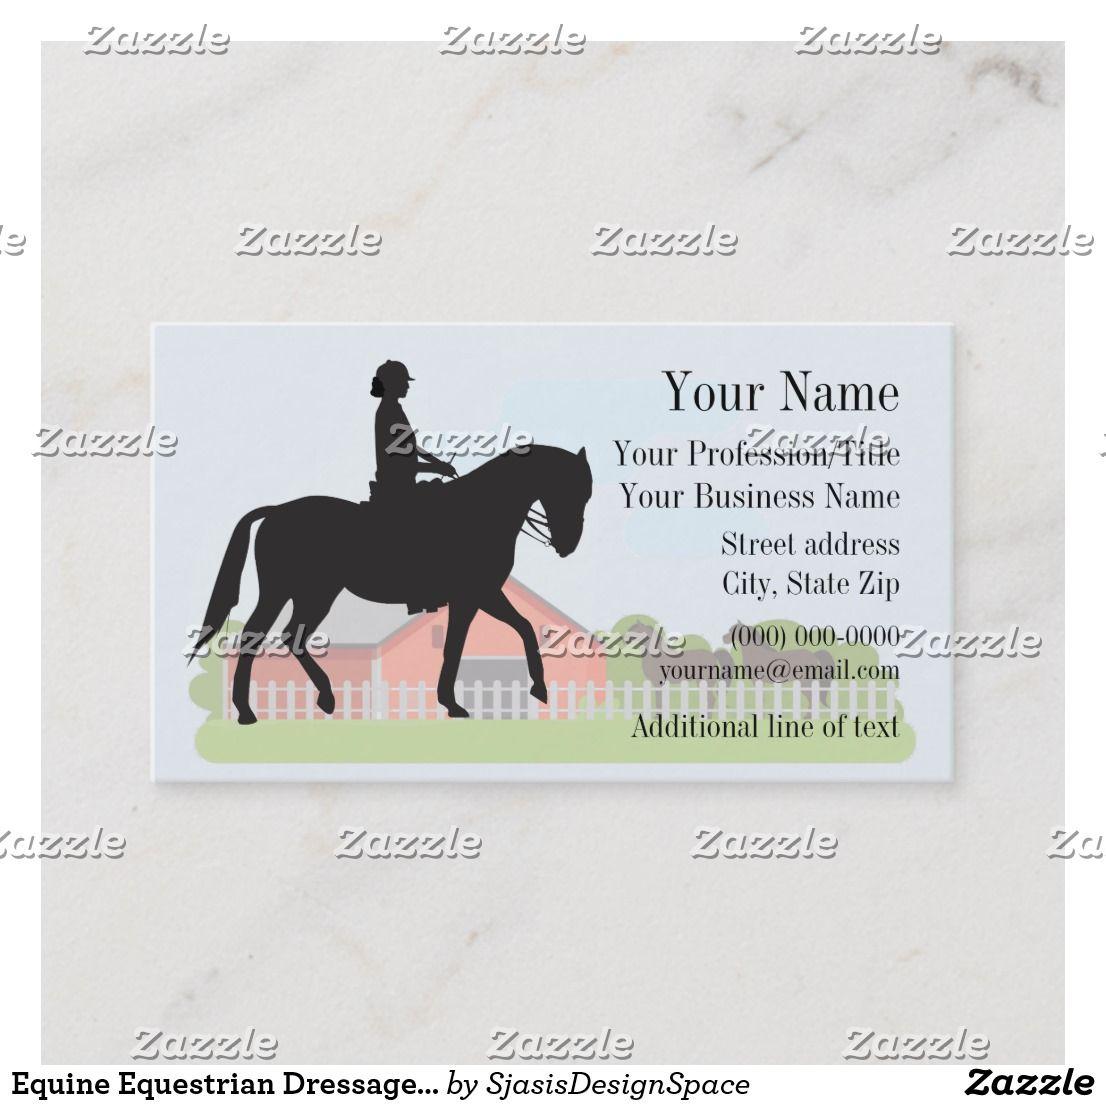 Equine Equestrian Dressage Business Card Zazzle Com Equestrian Dressage Dressage Cards